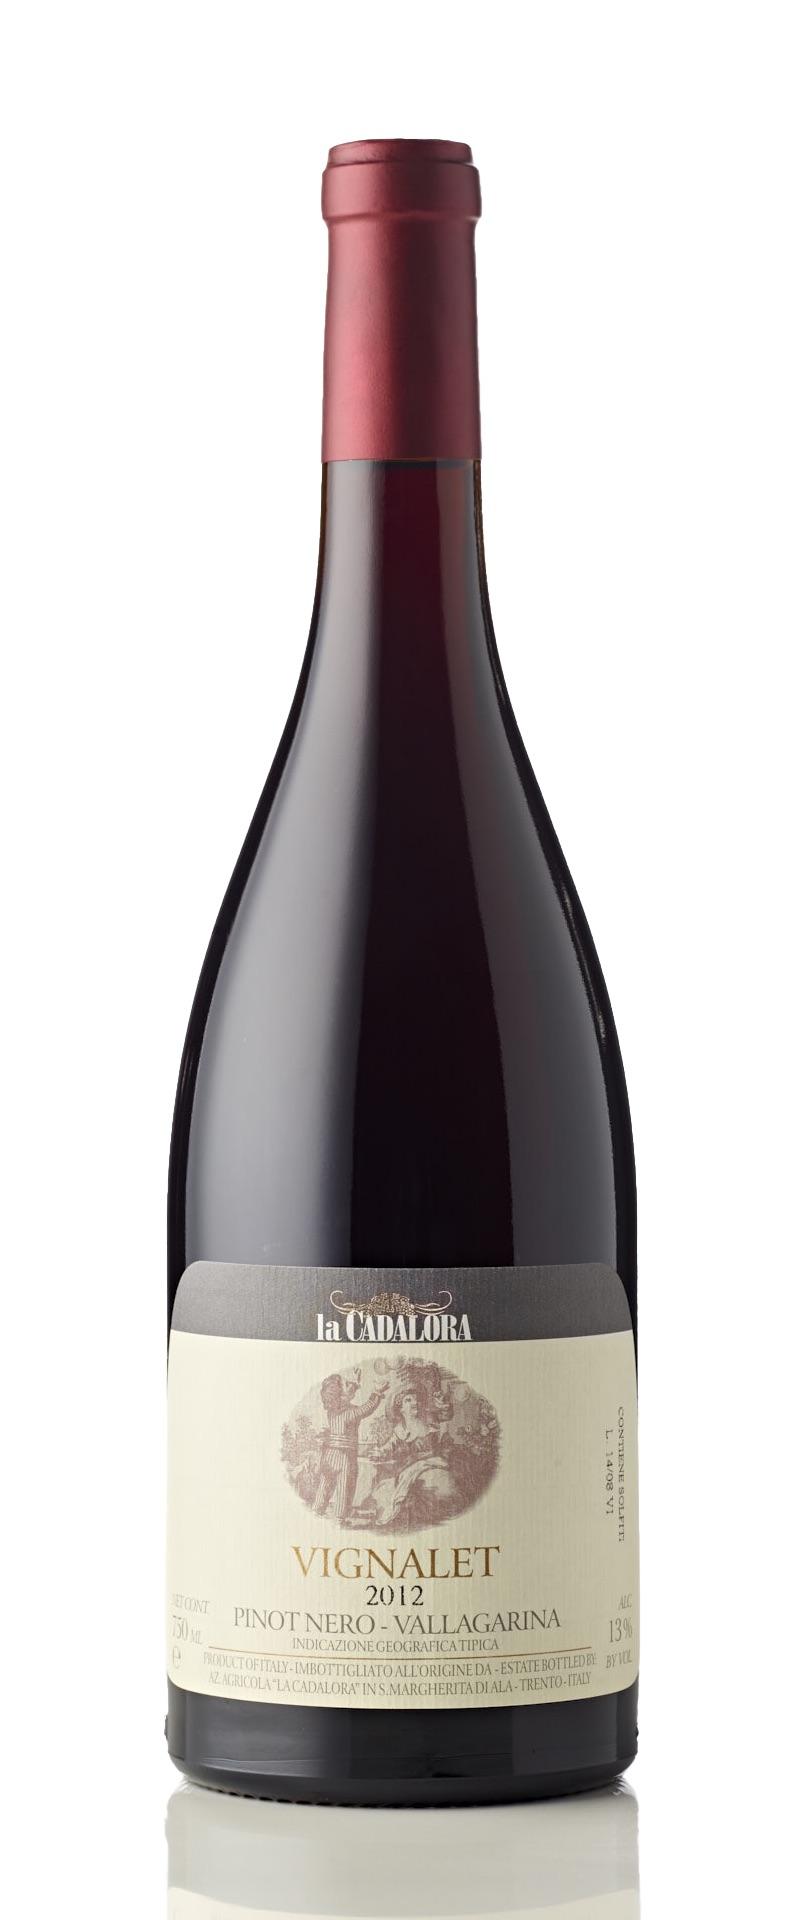 La Cadalora Vignalet Pinot Nero Vallagarina IGT.jpg